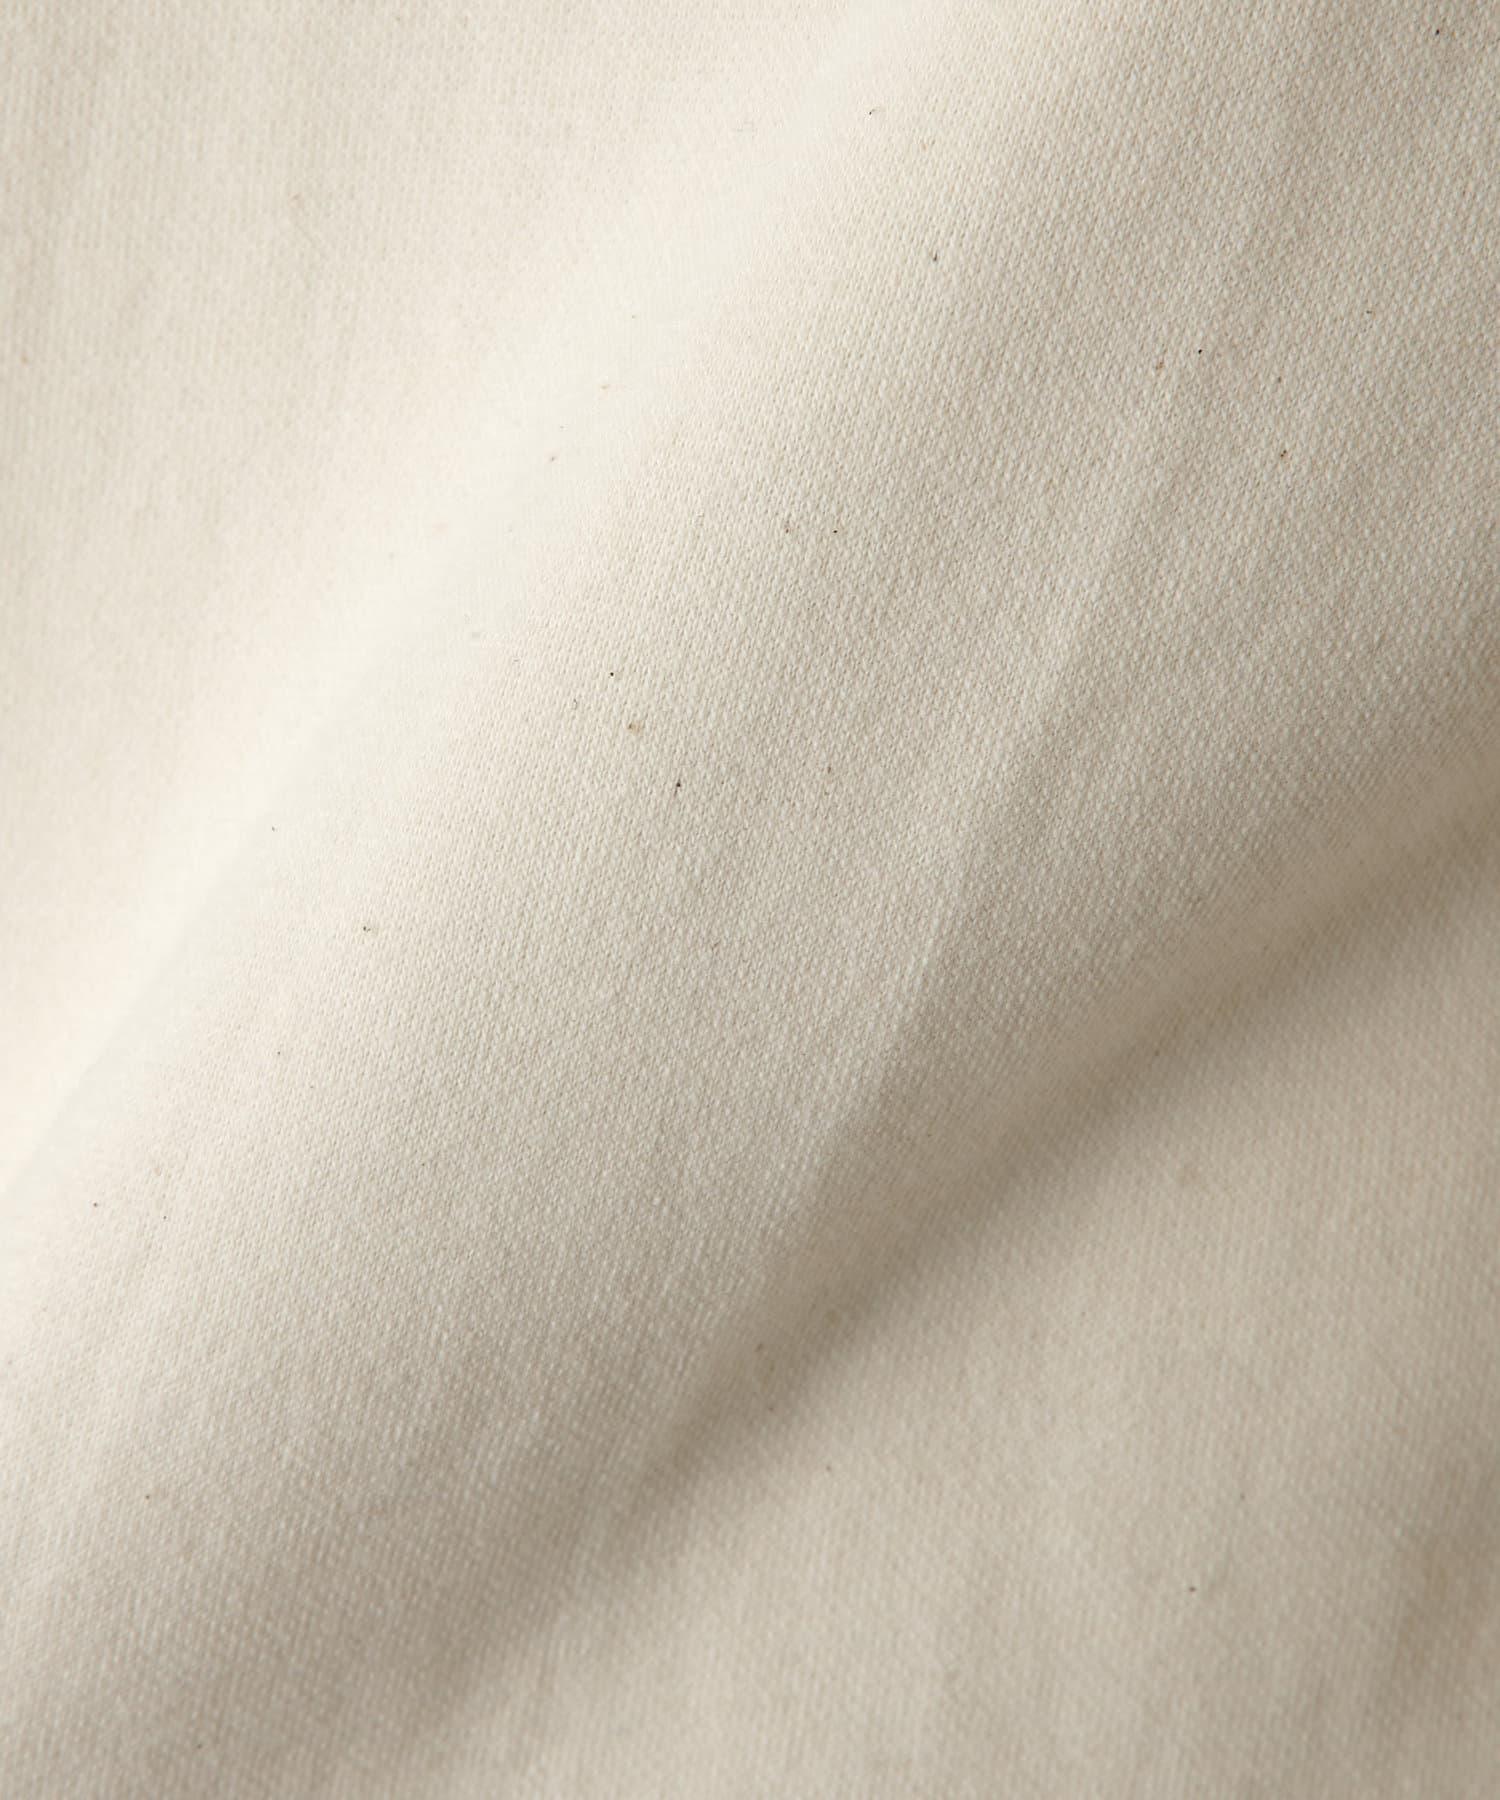 GALLARDAGALANTE(ガリャルダガランテ) 【IIROT】ヘビーニットプルオーバー